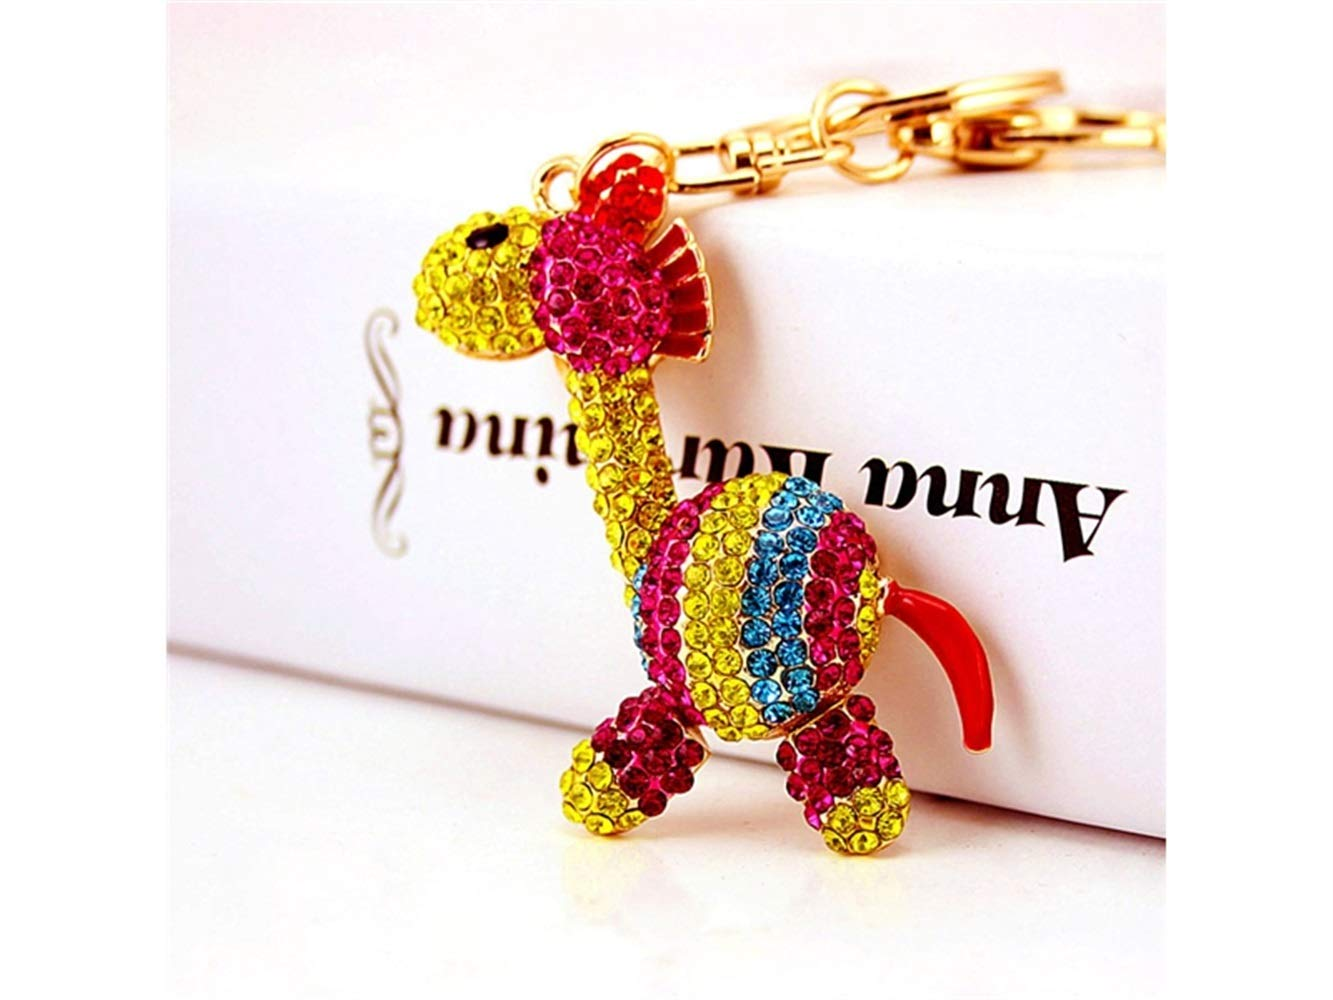 Car Keychain, Exquisite Cute Striped Zebra Keychain Animal Key Trinket Car Bag Key Holder Decorations(Colorful) for Gift